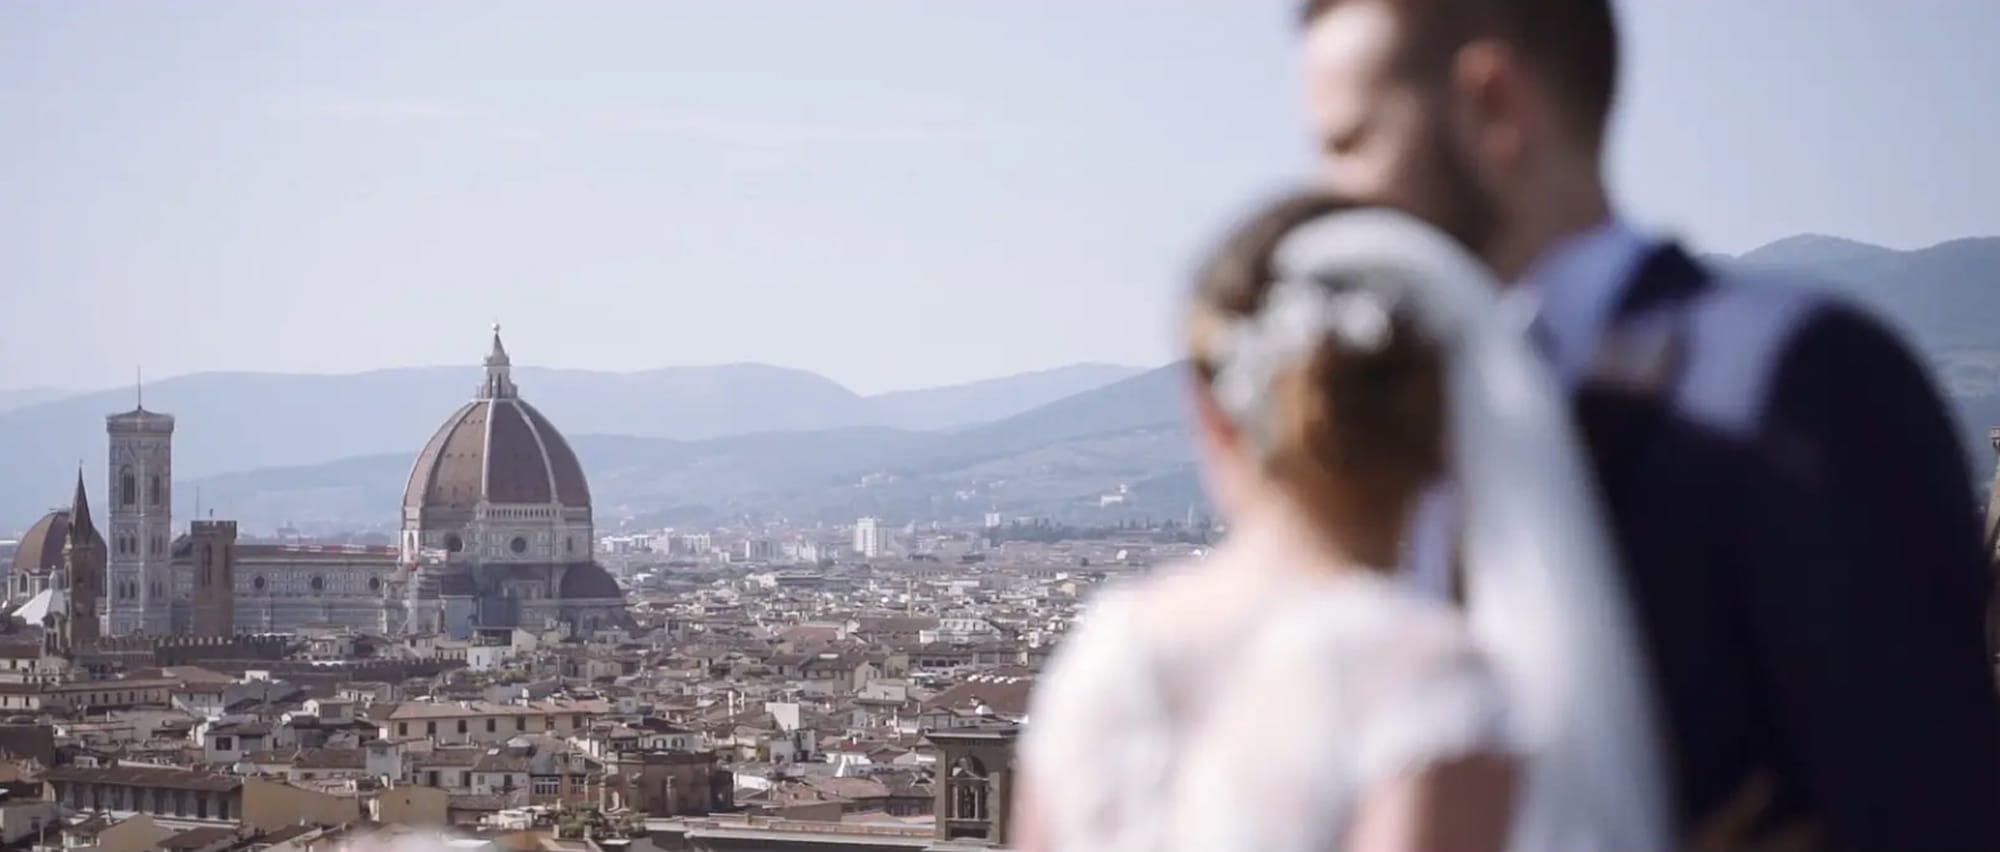 wedding videomaker in borgo machiavelli, san casciano val di pesa, florence